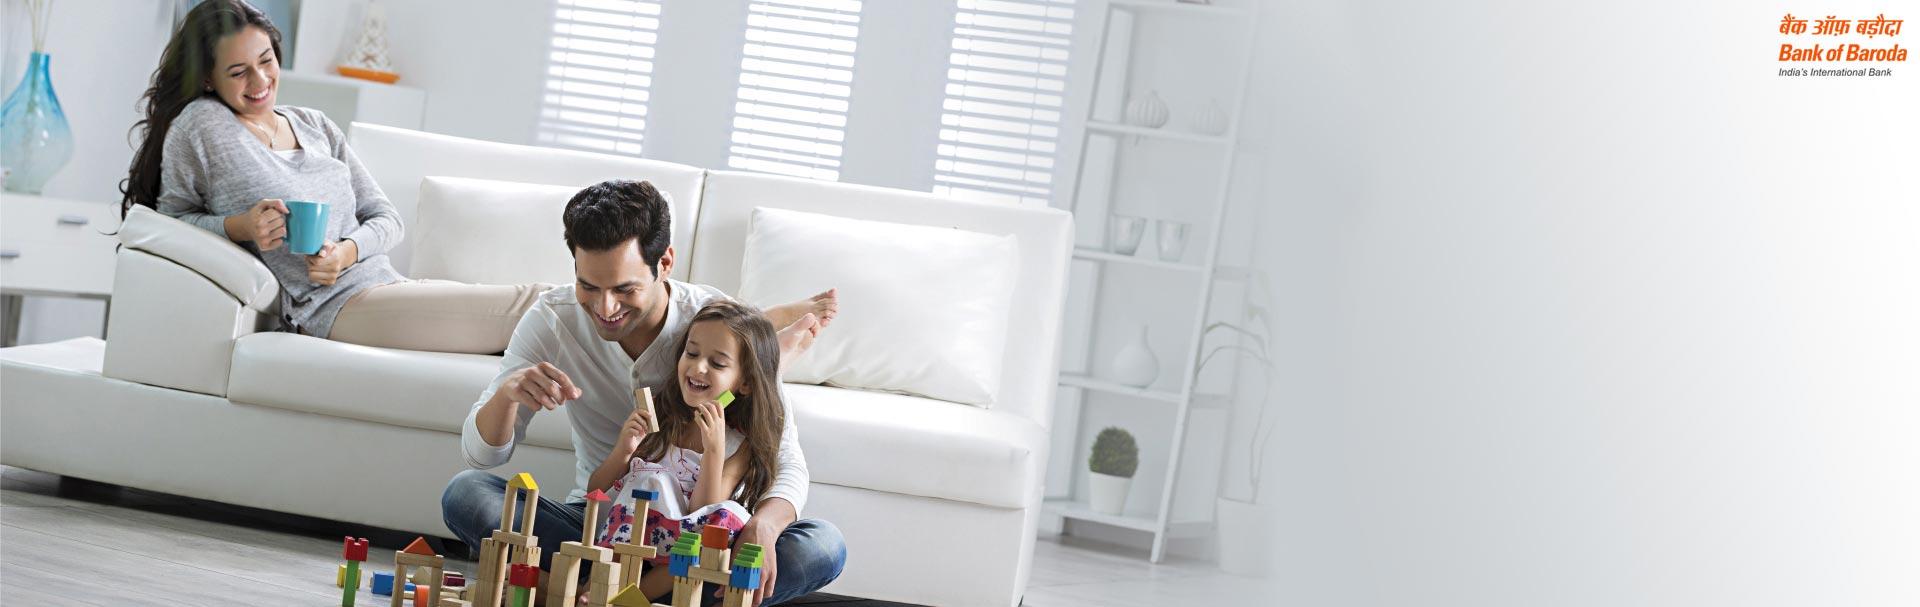 Baroda Home Loan Advantage